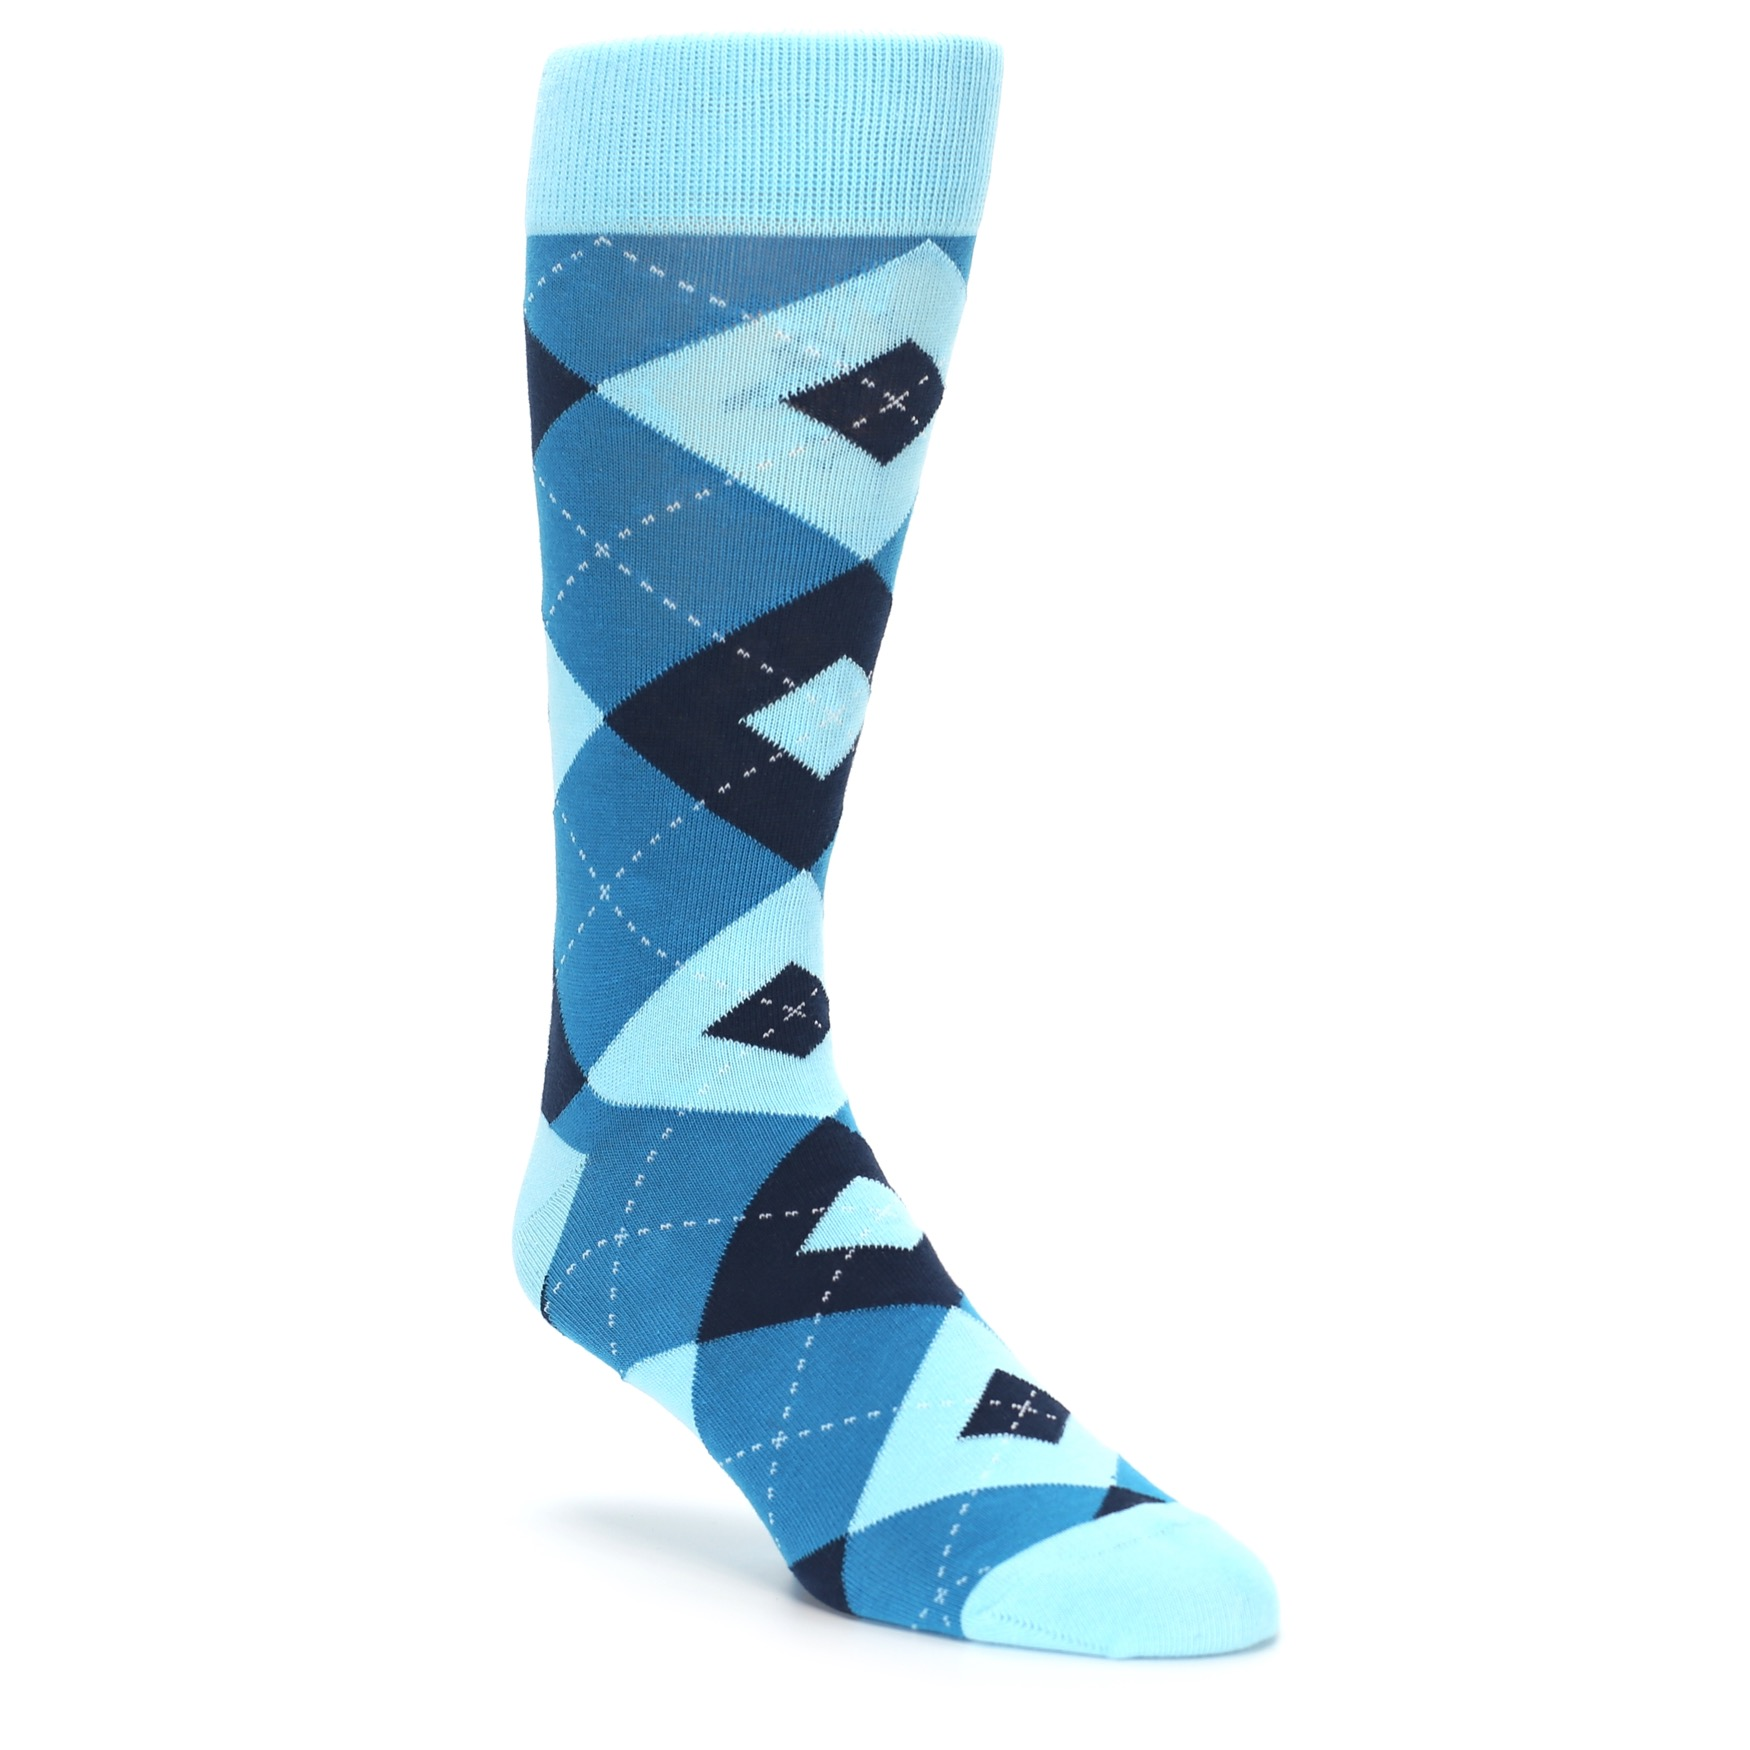 Pacific Teal Pool Navy Argyle Men's Dress Socks